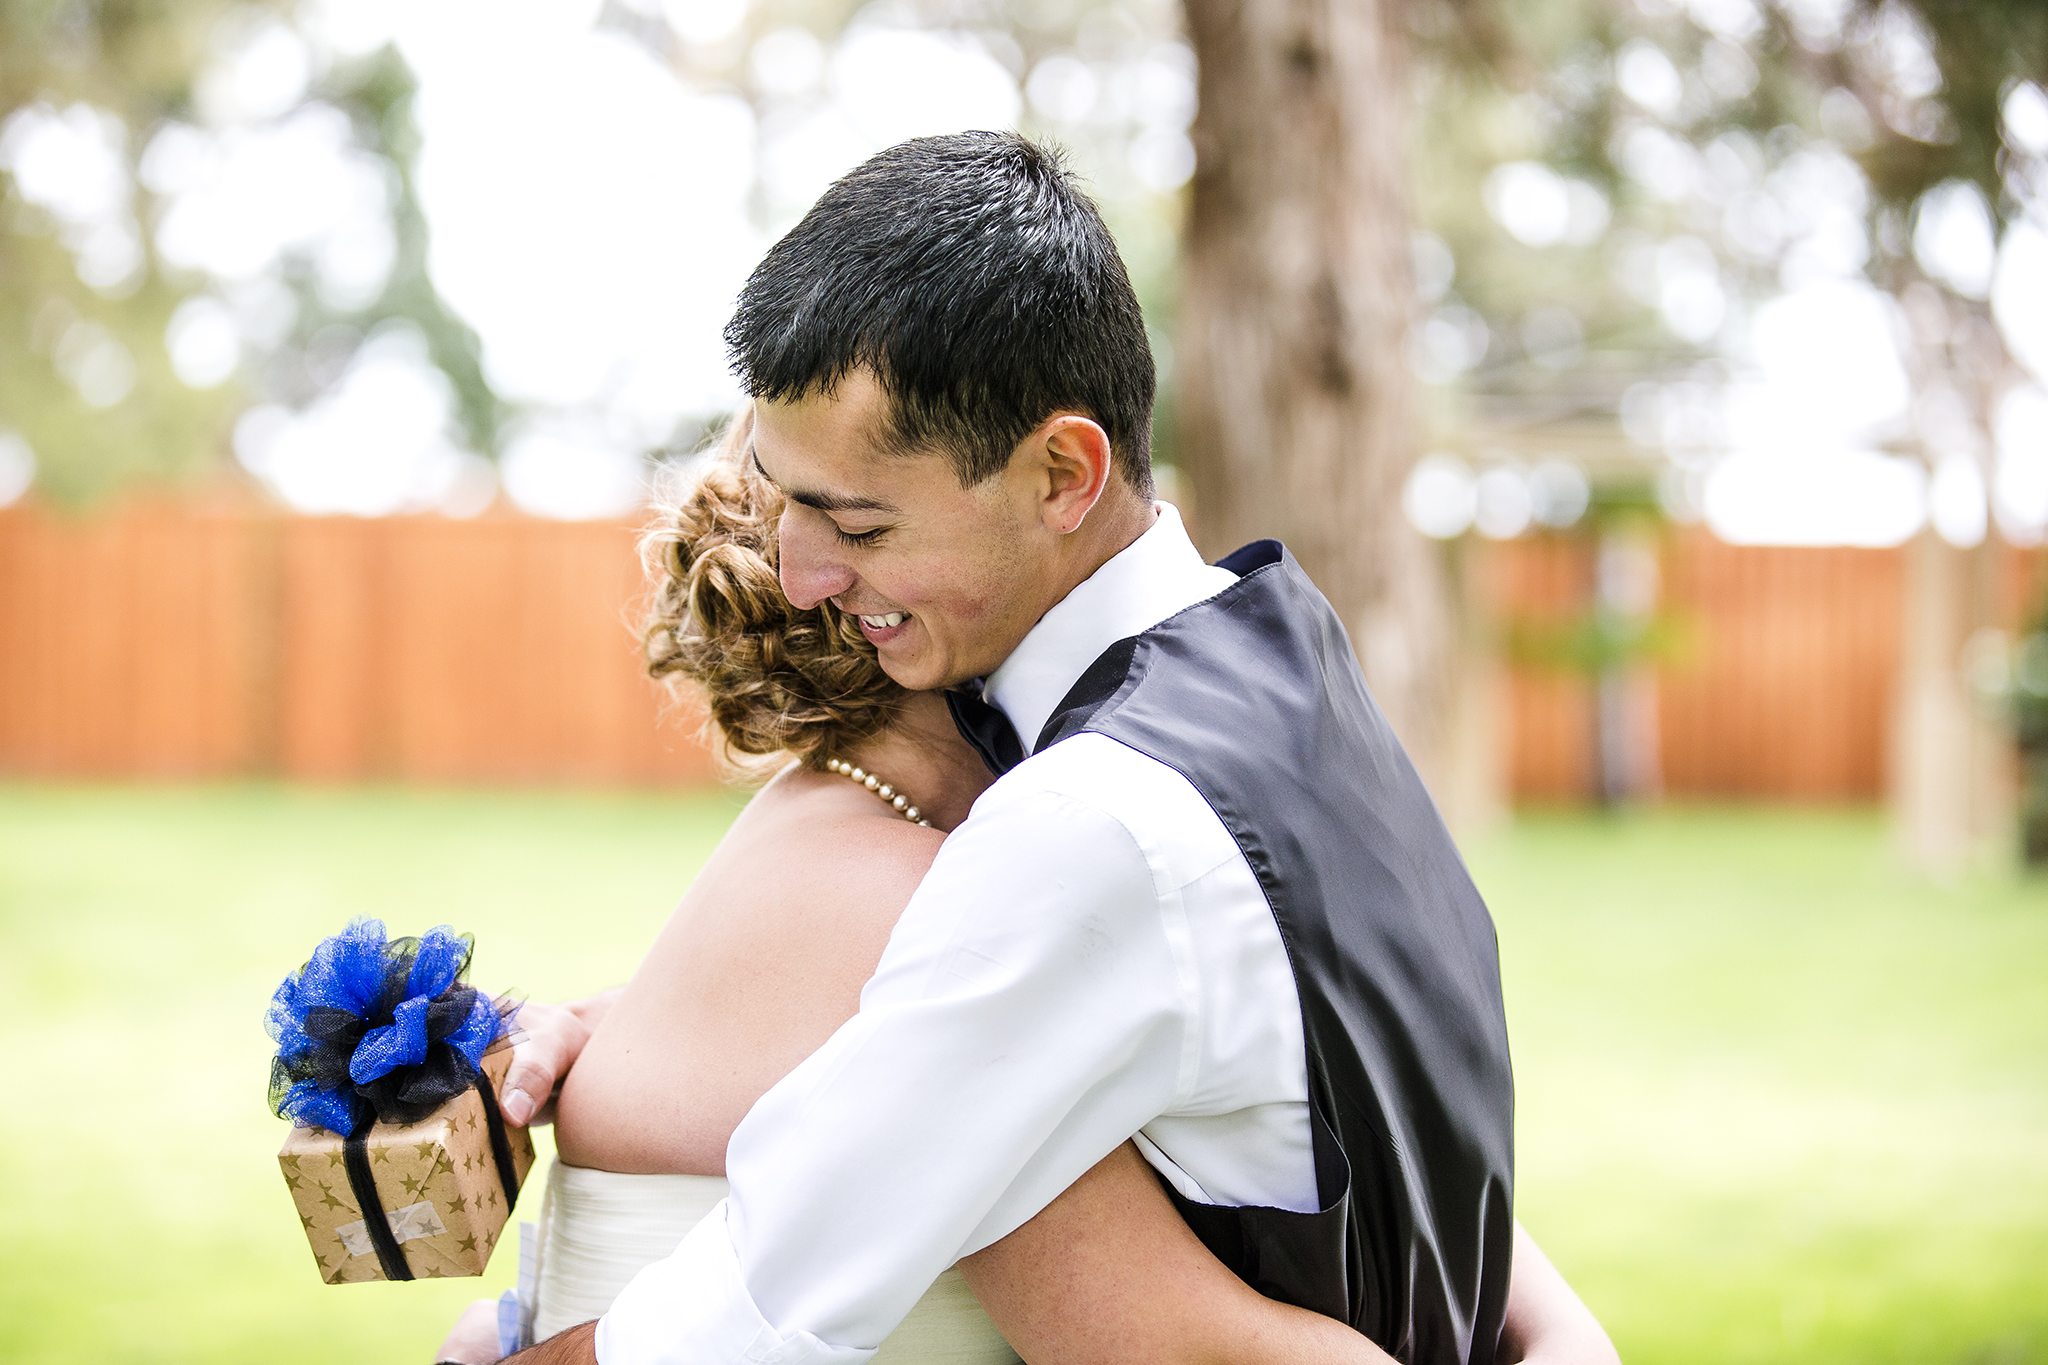 Romantic, Walnut Tree Weddings, gifts, First Look